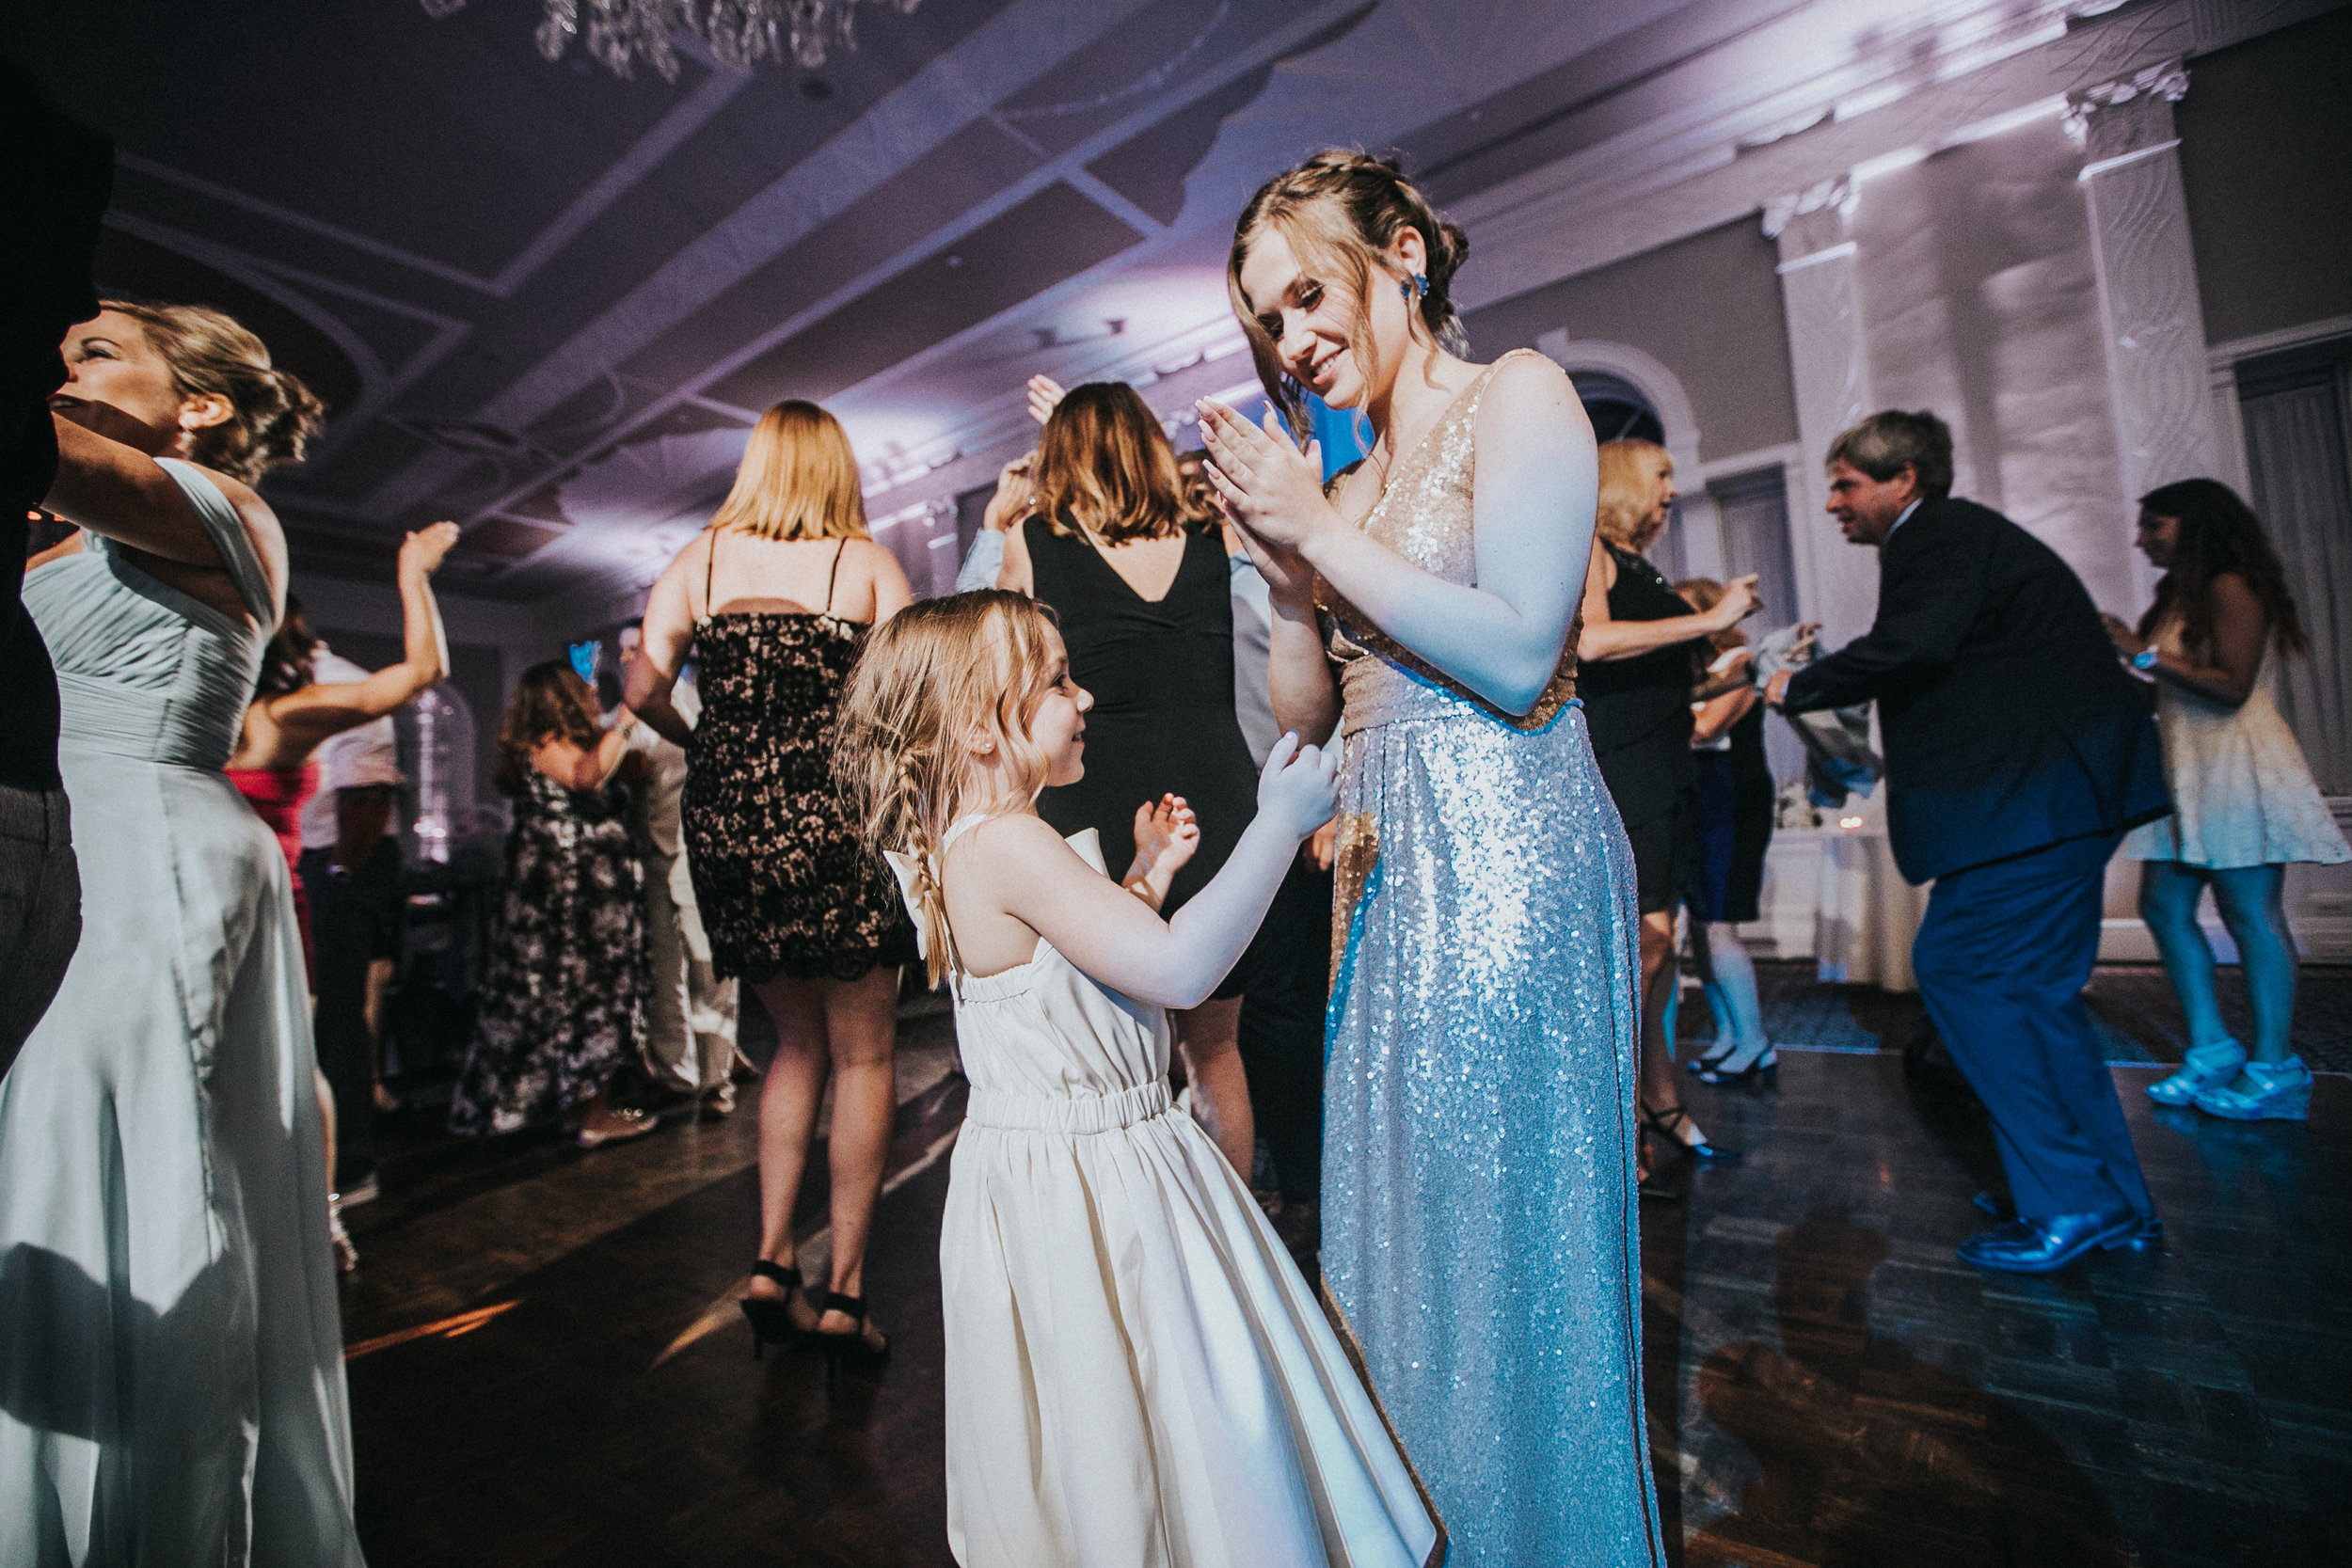 JennaLynnPhotography-NJWeddingPhotographer-Wedding-TheBerkeley-AsburyPark-Allison&Michael-Reception-178.jpg